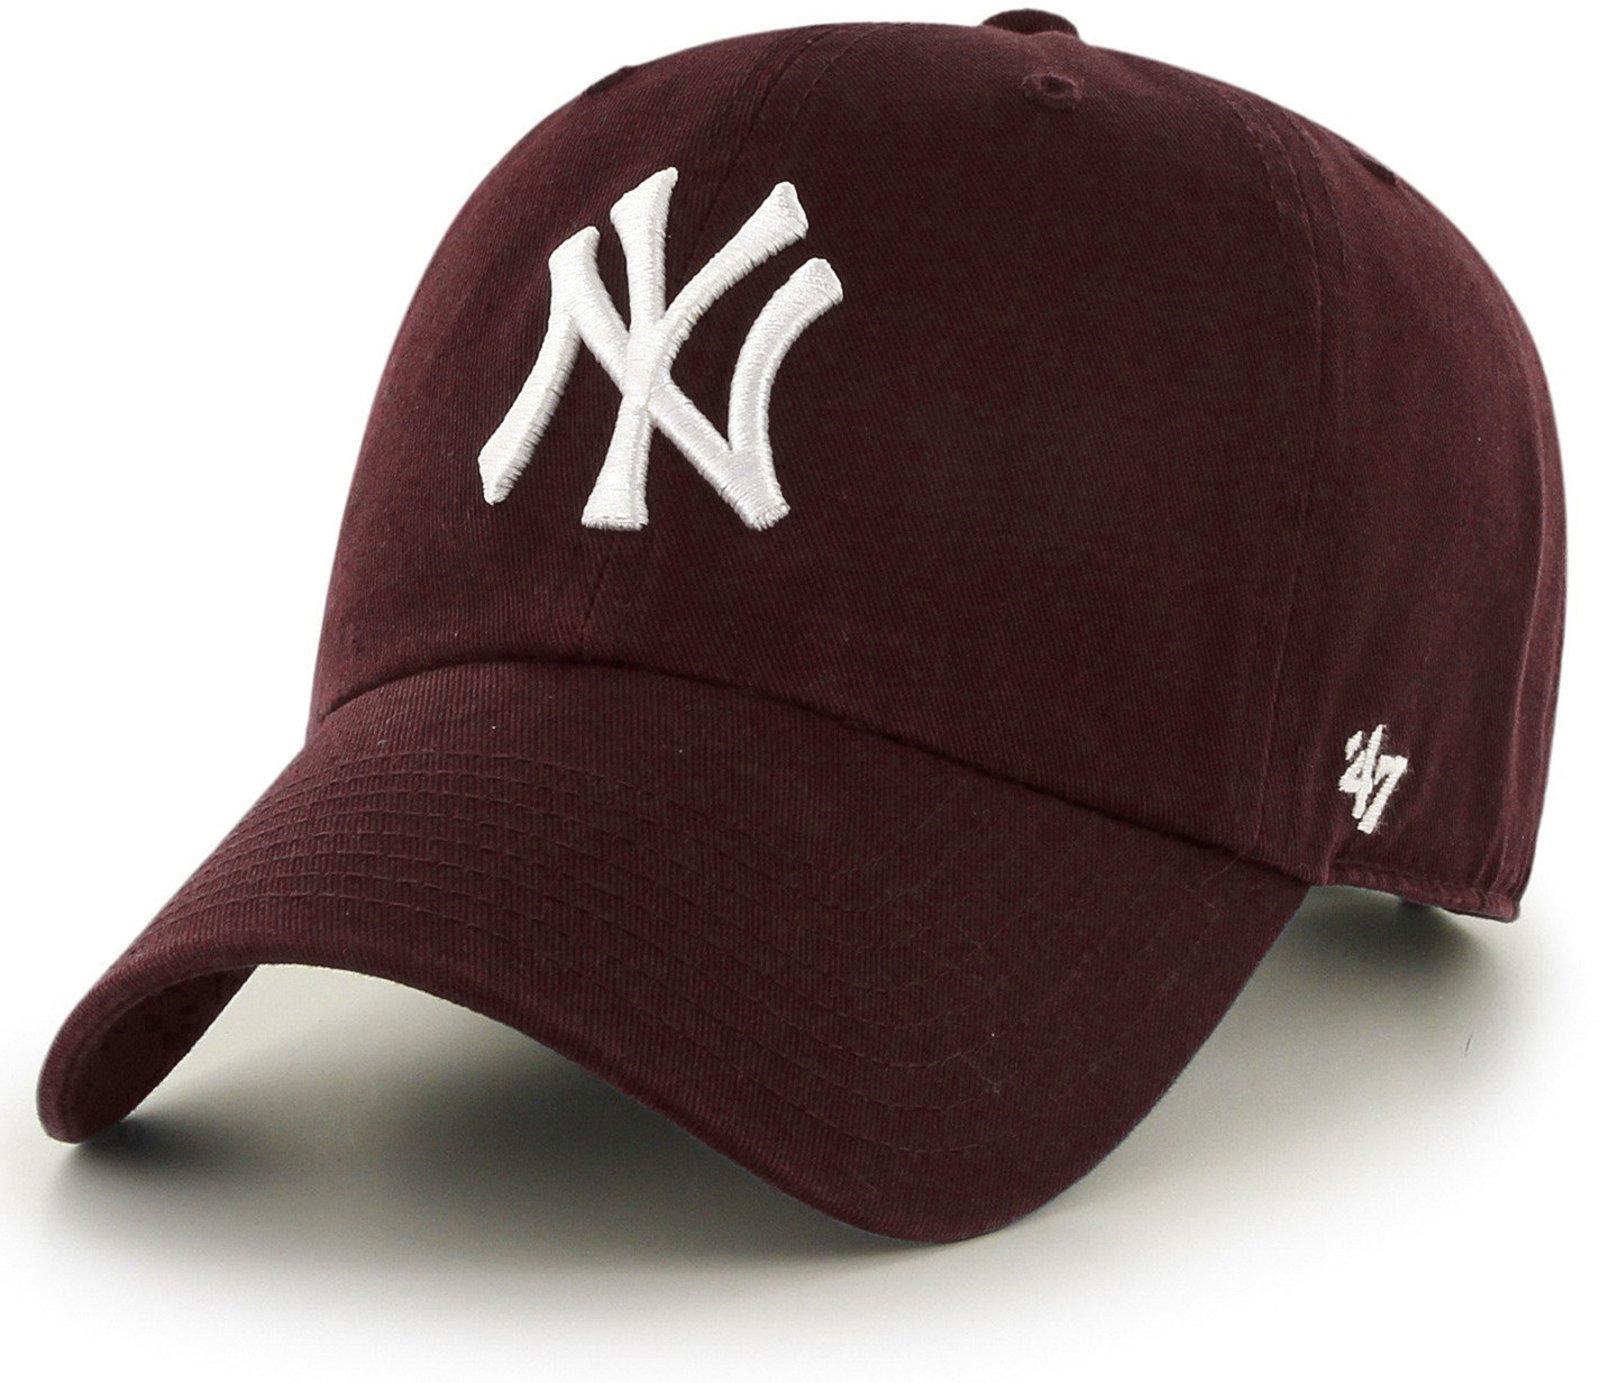 9d24d89a644 47 Brand Mlb New York Yankees  47 Clean Up Adjustable Baseball Cap ...